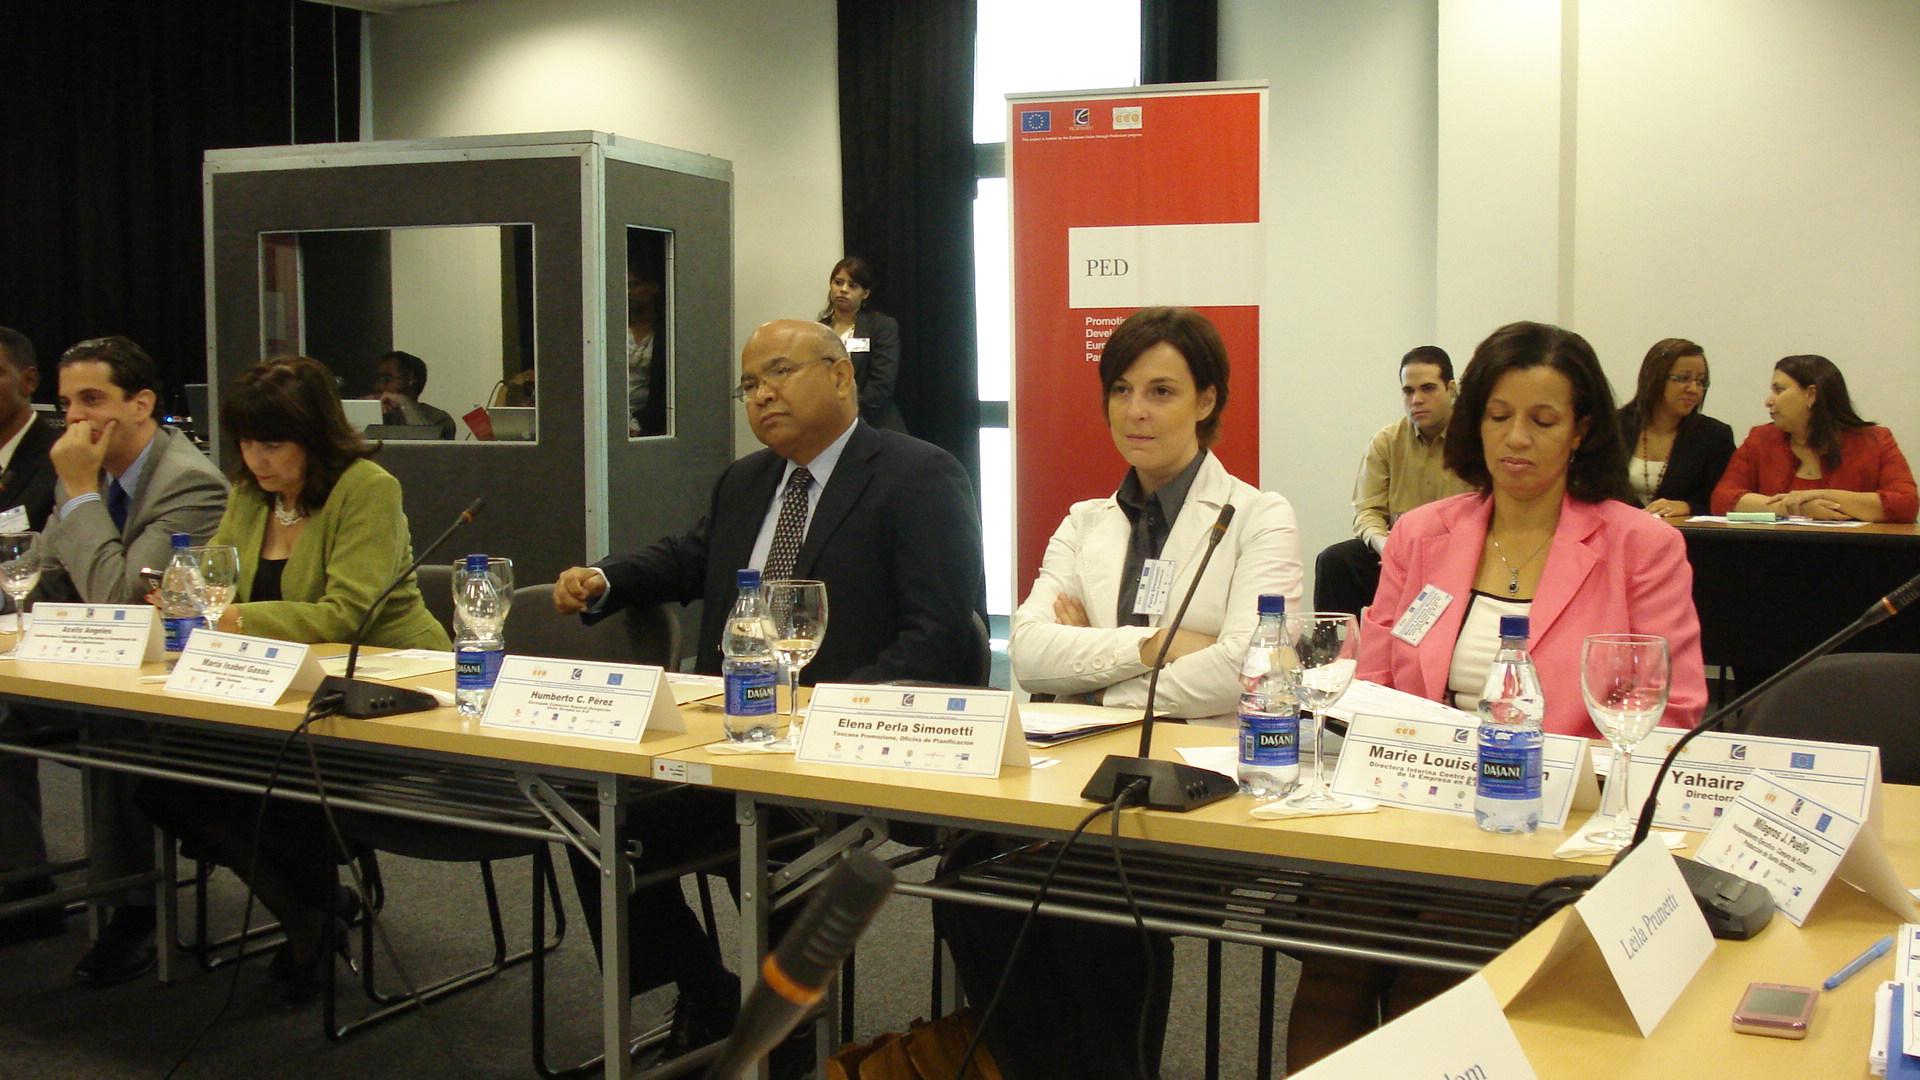 P.E.D. – Promoting the Economic Development through European and Caribbean